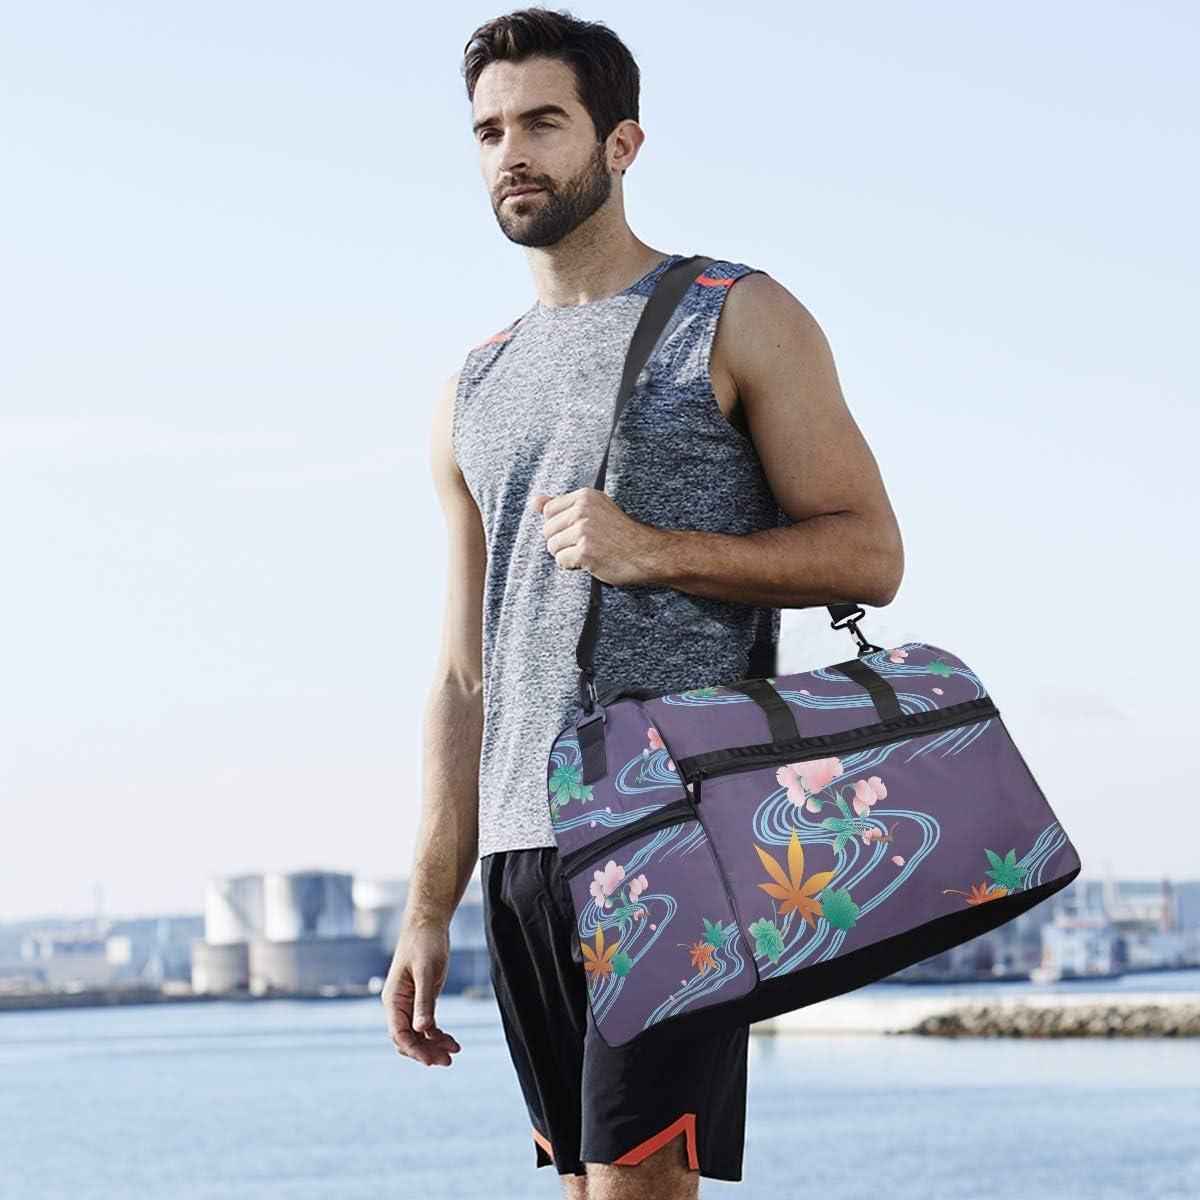 Travel Duffels Small Pond Duffle Bag Luggage Sports Gym for Women /& Men